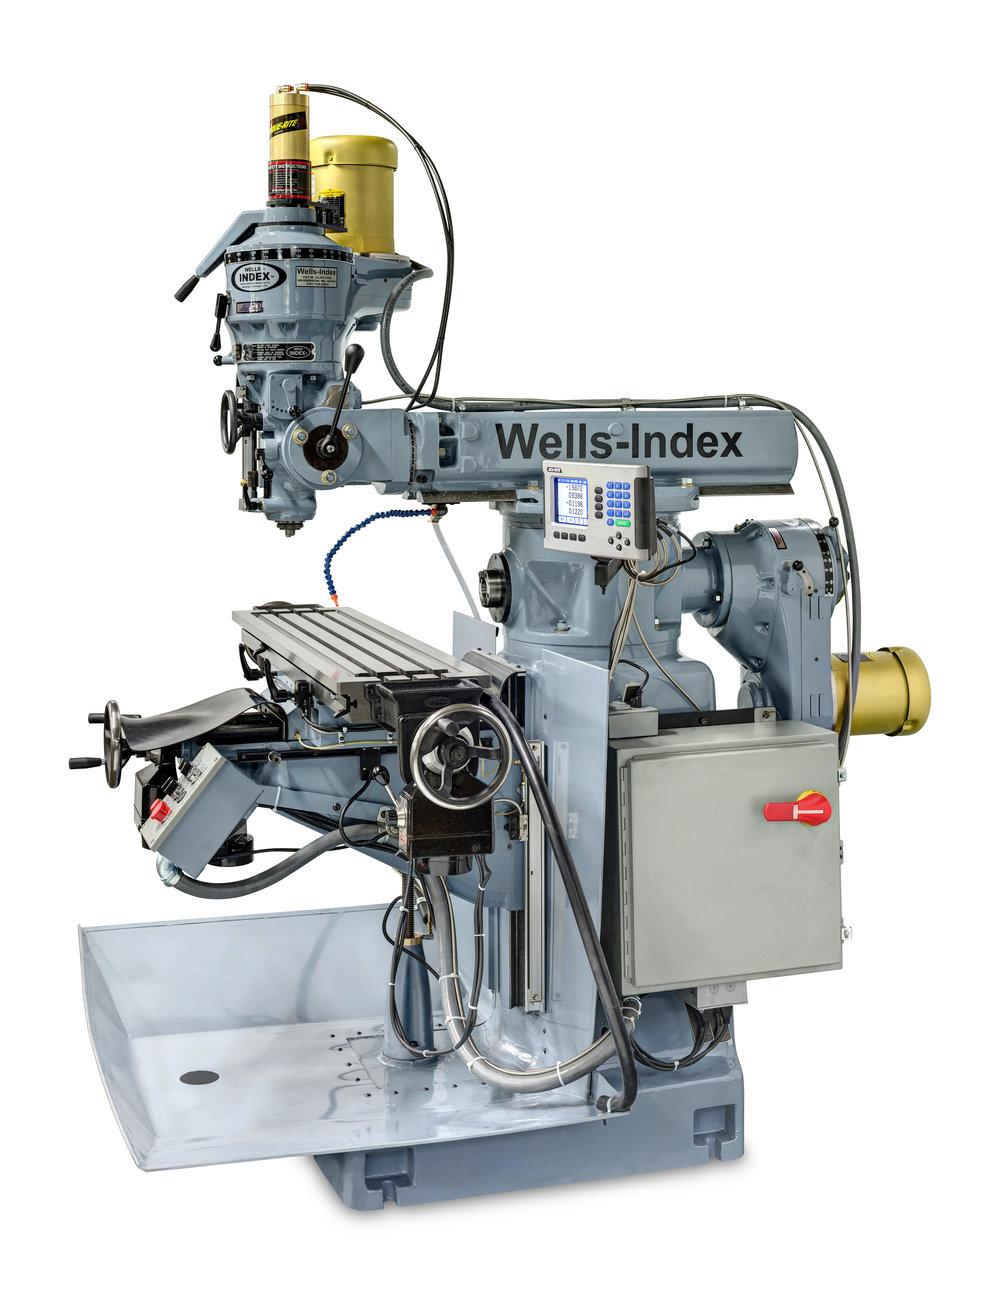 Model 860c Mill